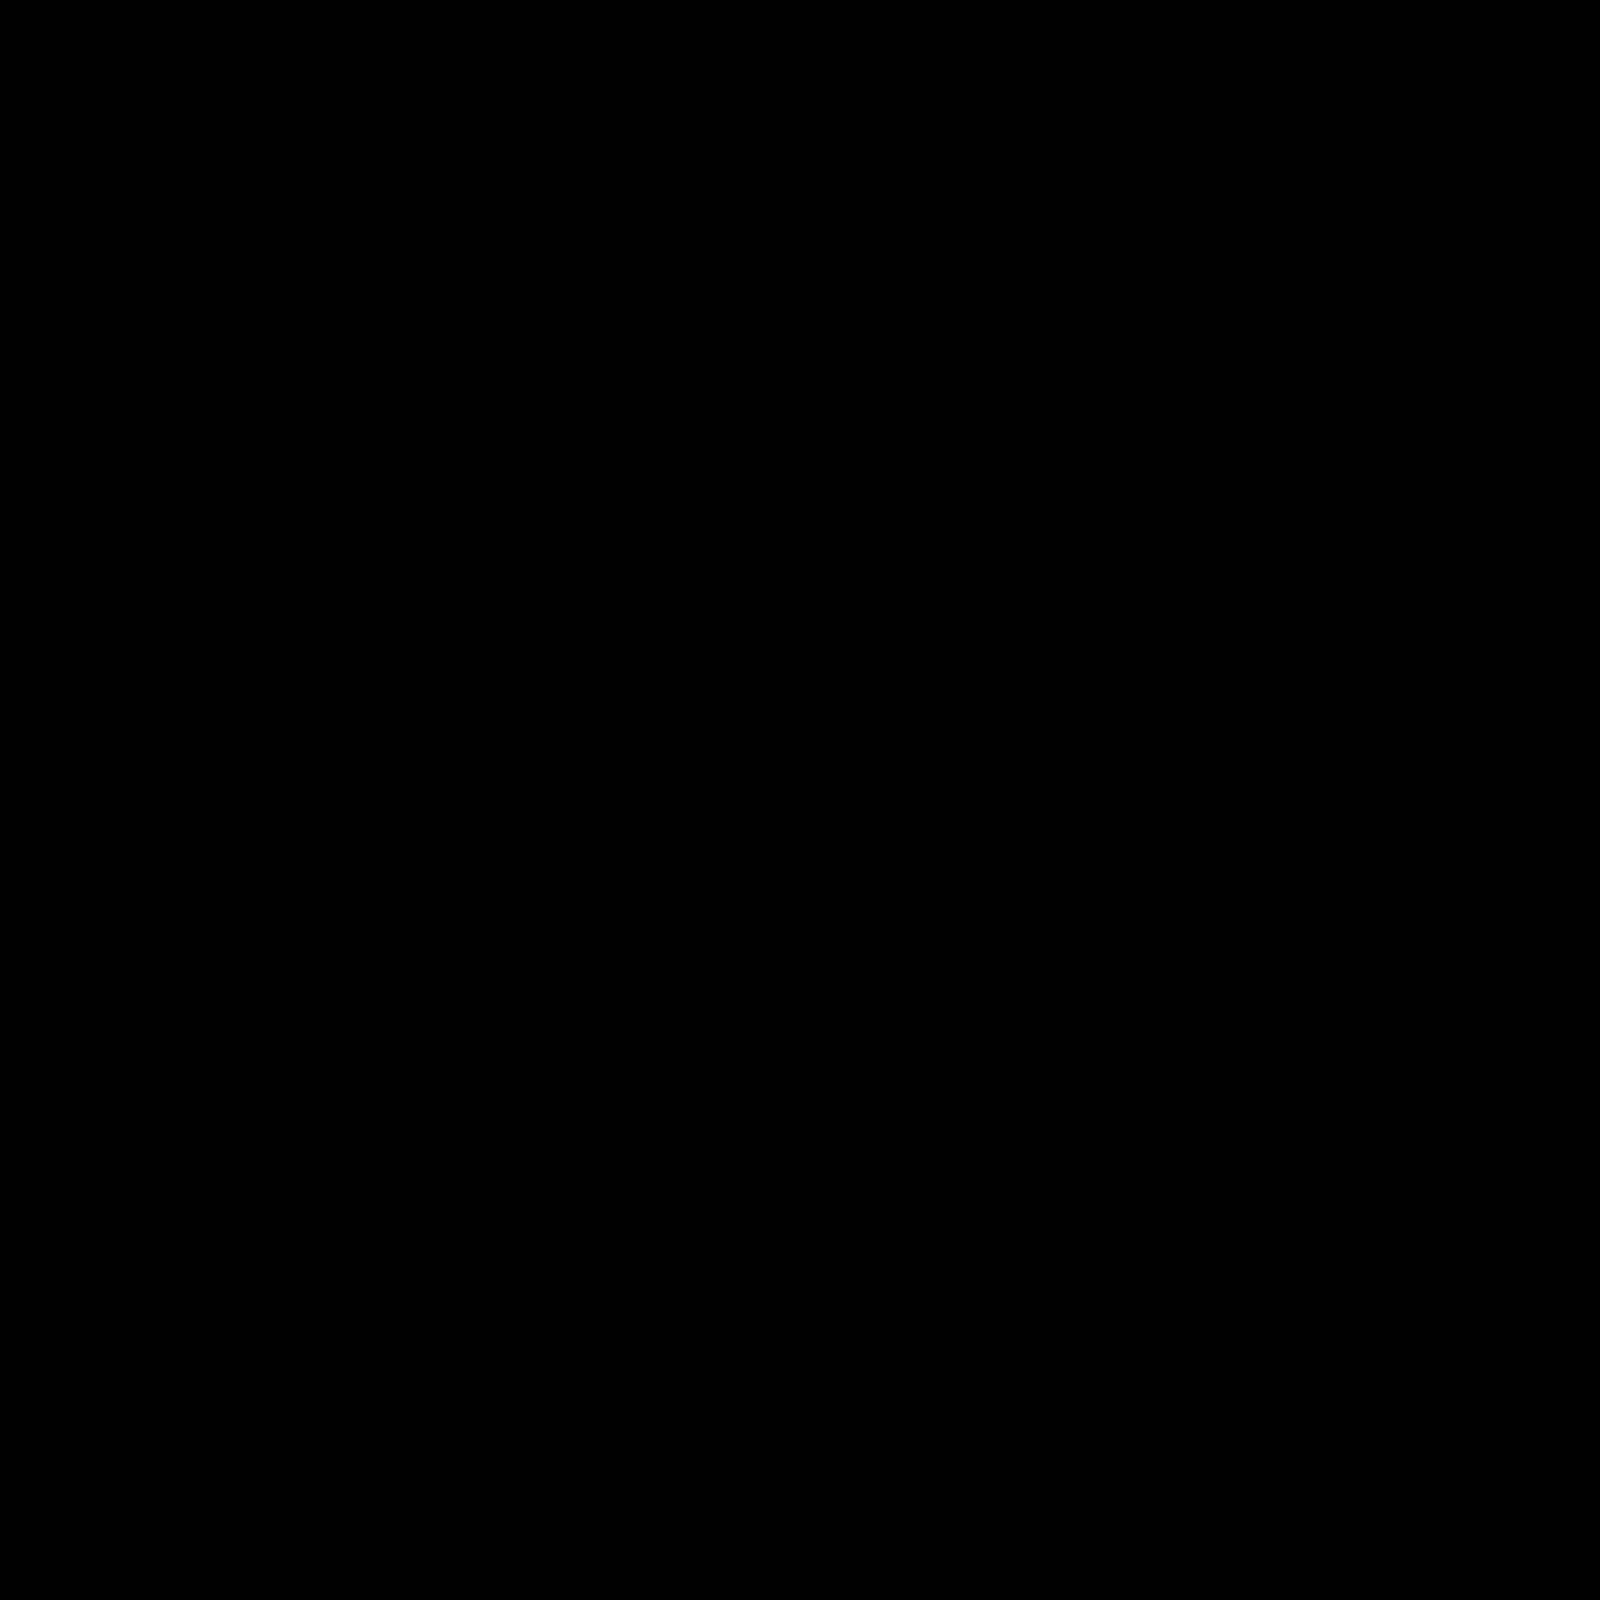 SolidWorks Plastics icon